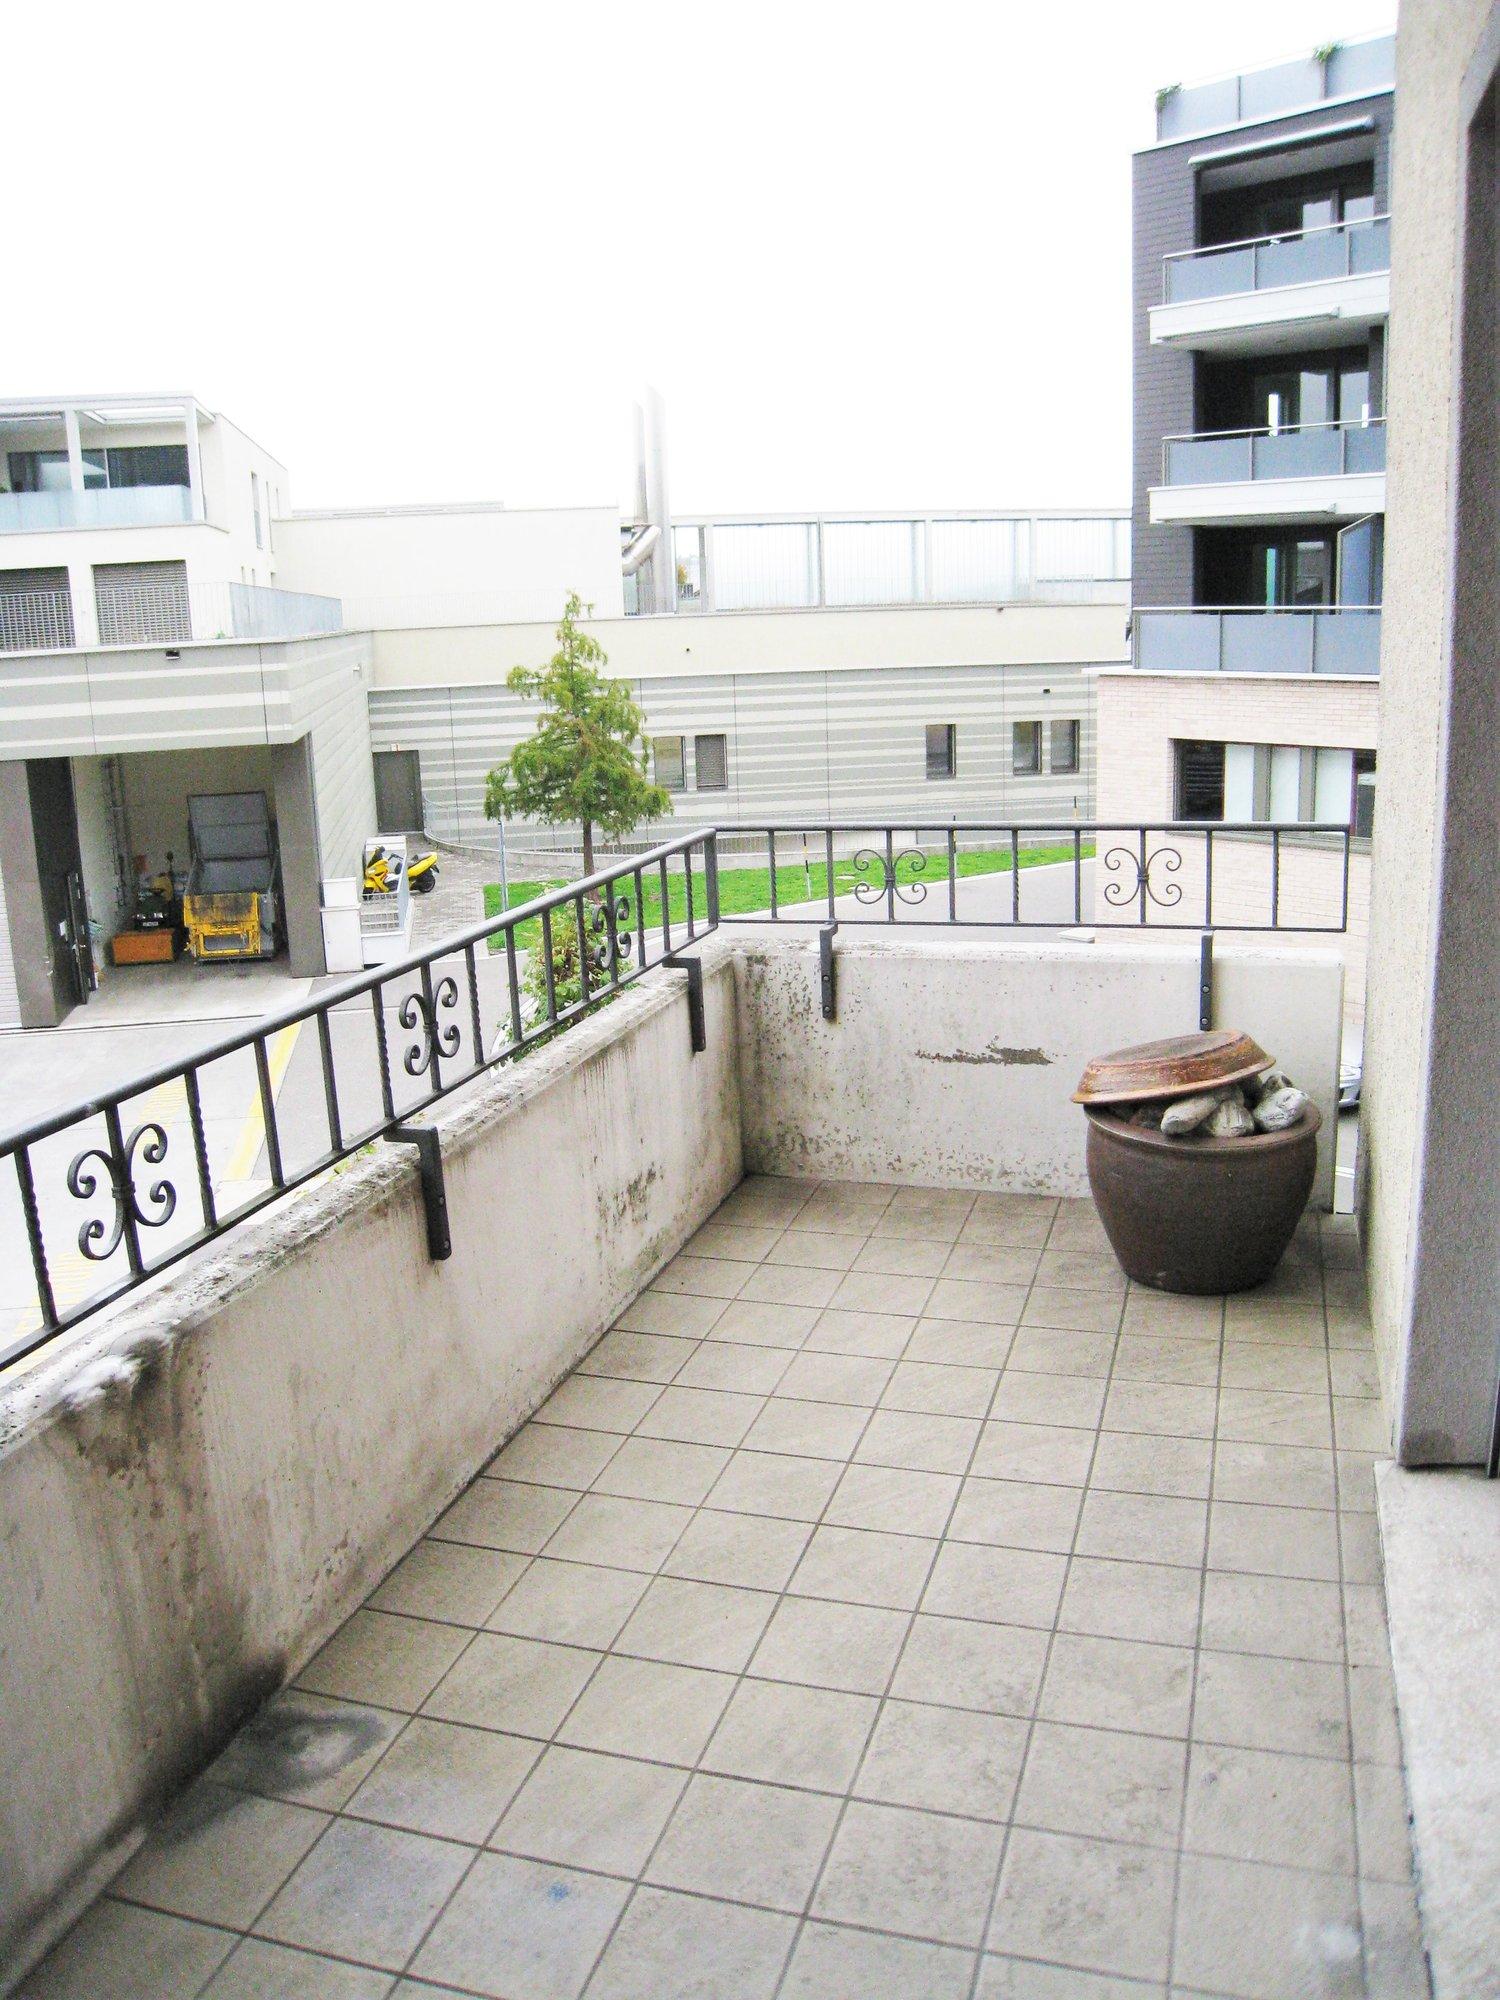 Oberdorfstrasse 15